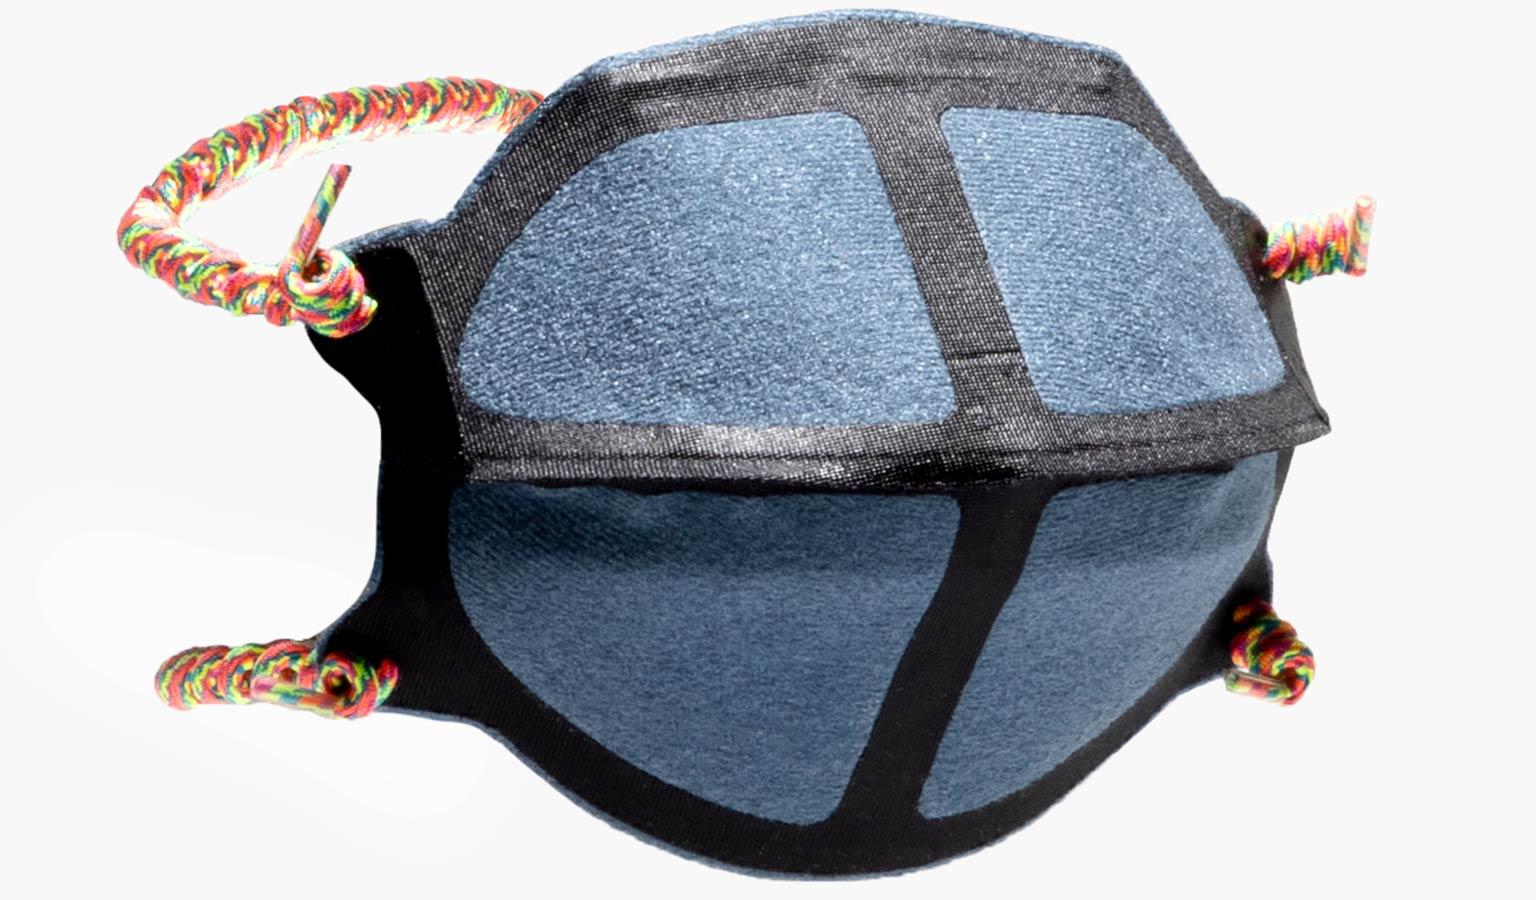 New Balance Coronavirus Mask Prototype